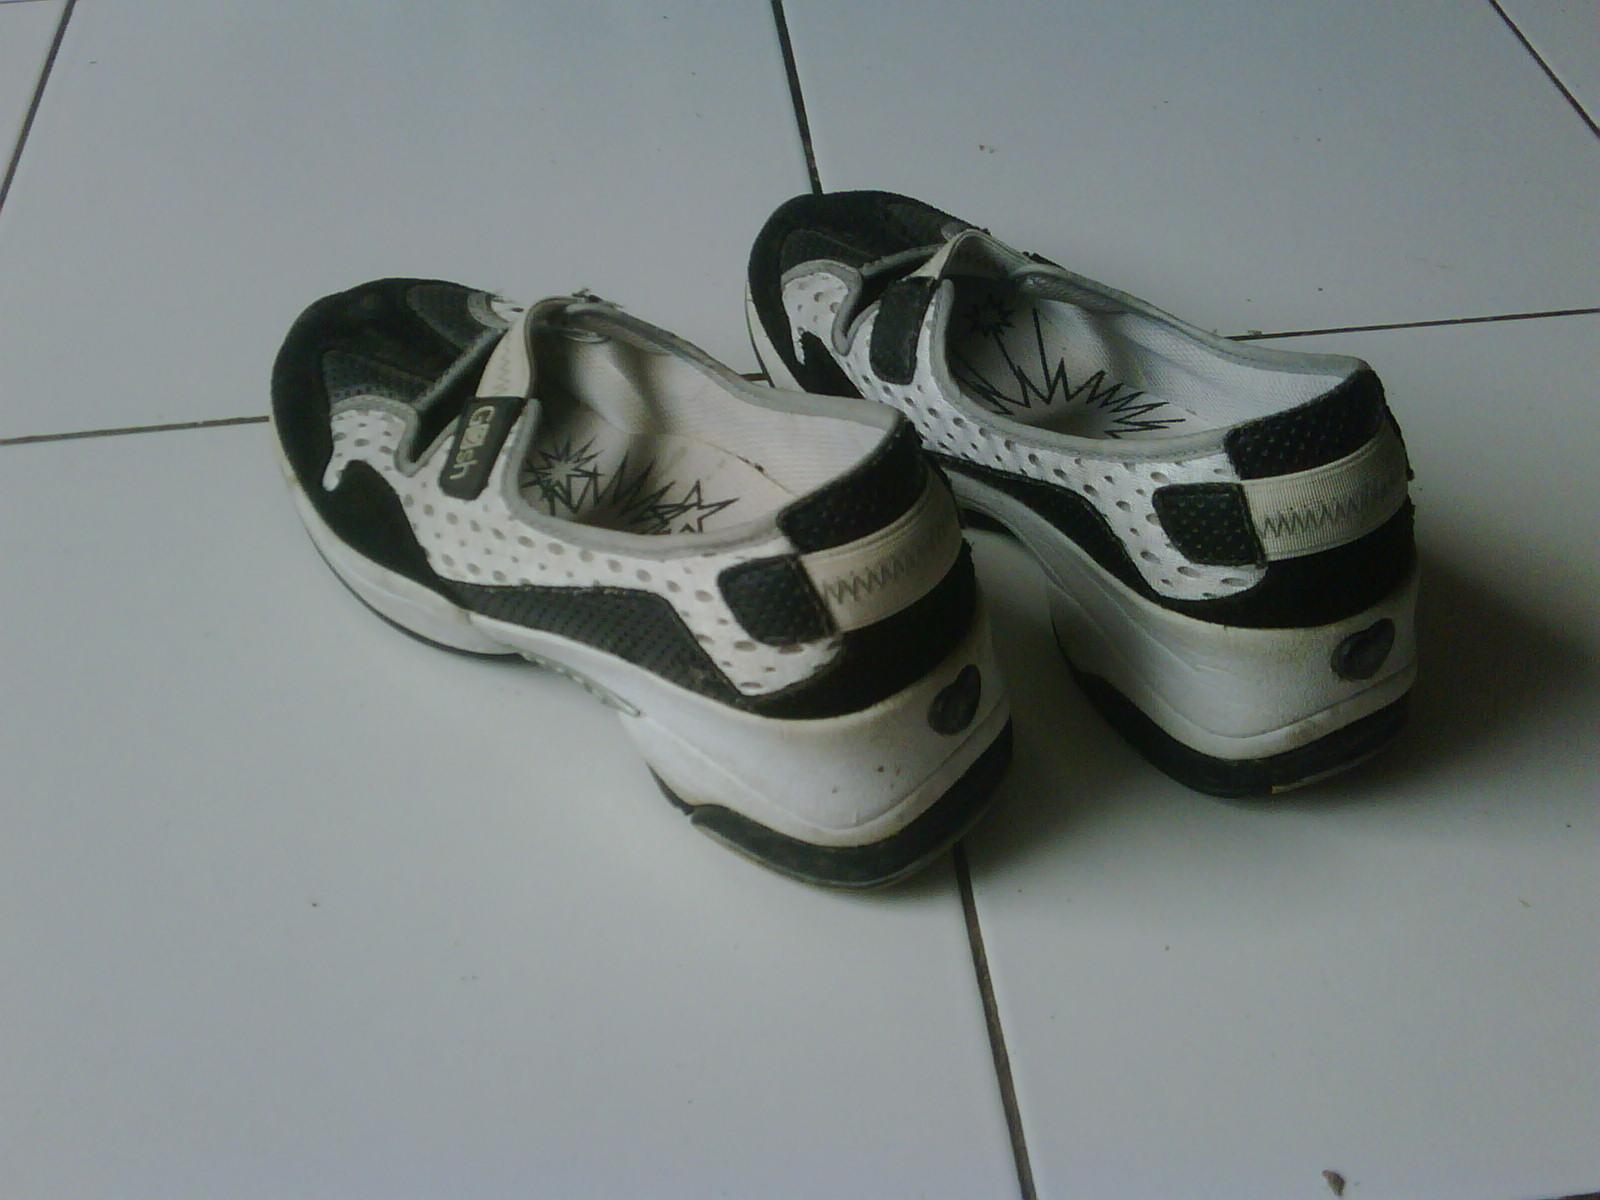 Lemari Cantik Gs17 Sepatu Sporty Gosh Ukuran 38 39 100 Original Sold